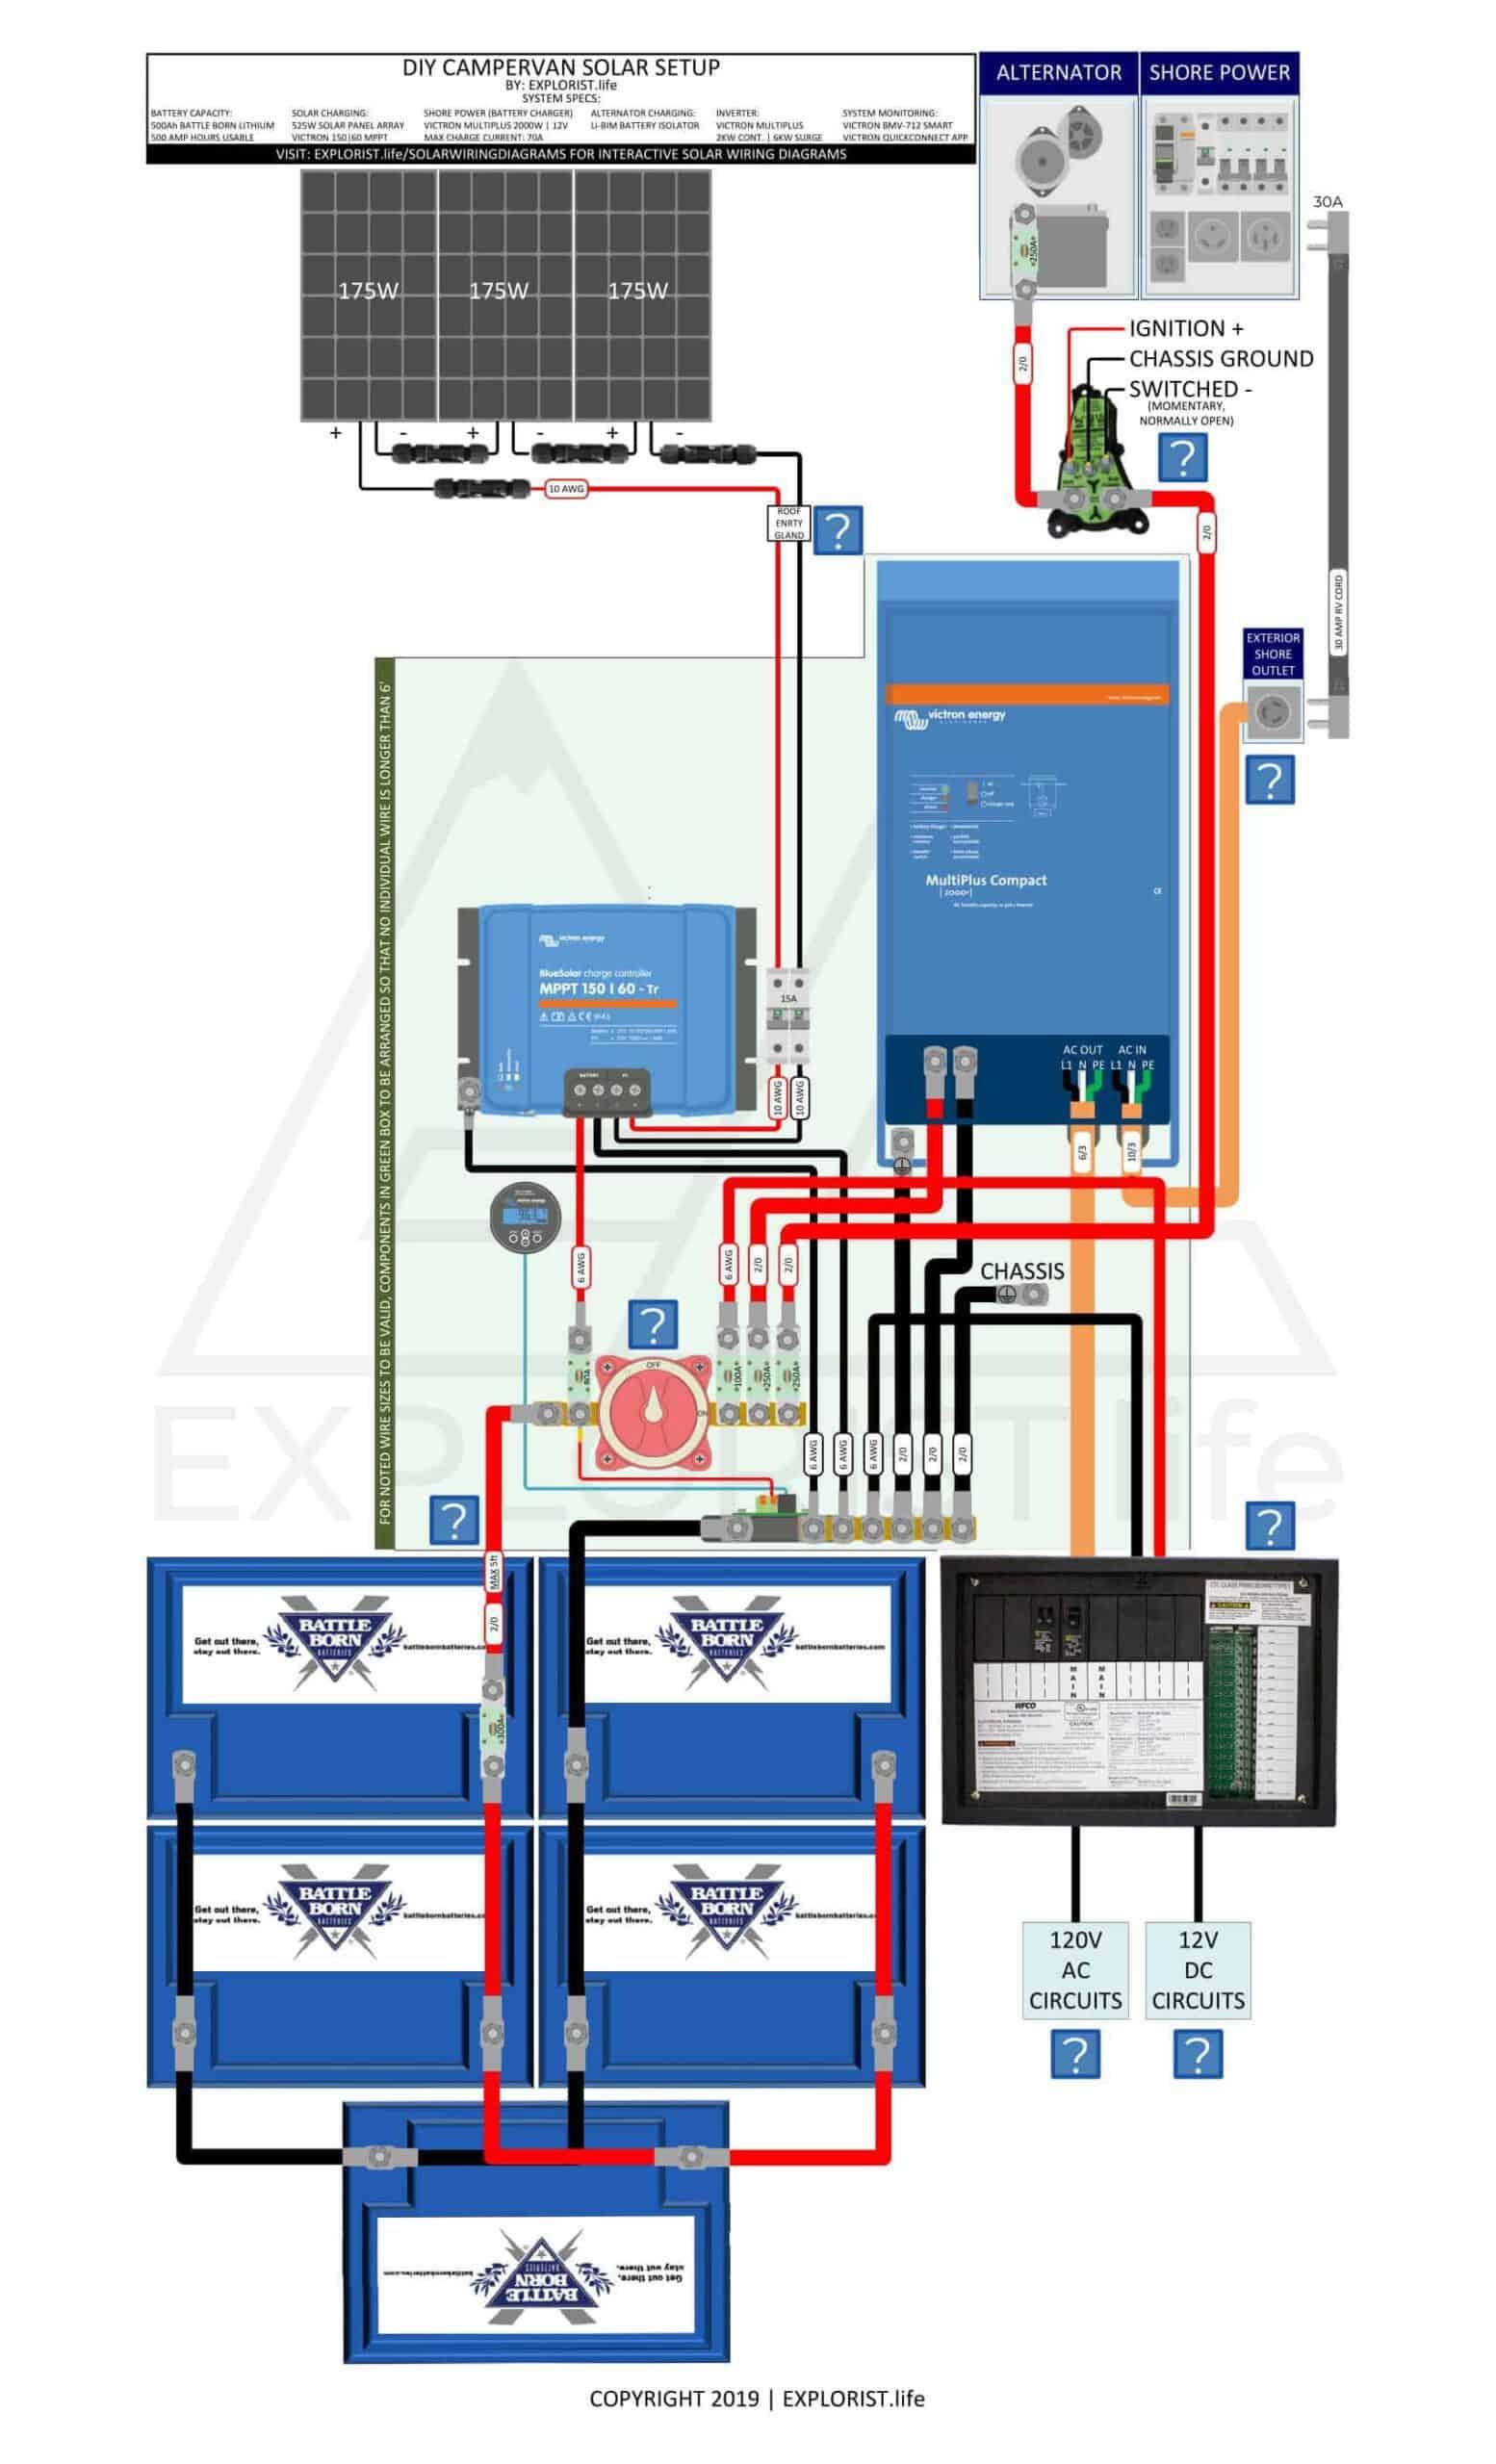 500Ah Lithium Battery Bank – 3x175W Solar – 2kW Inverter/Charger – Li-BIM Alternator Charging